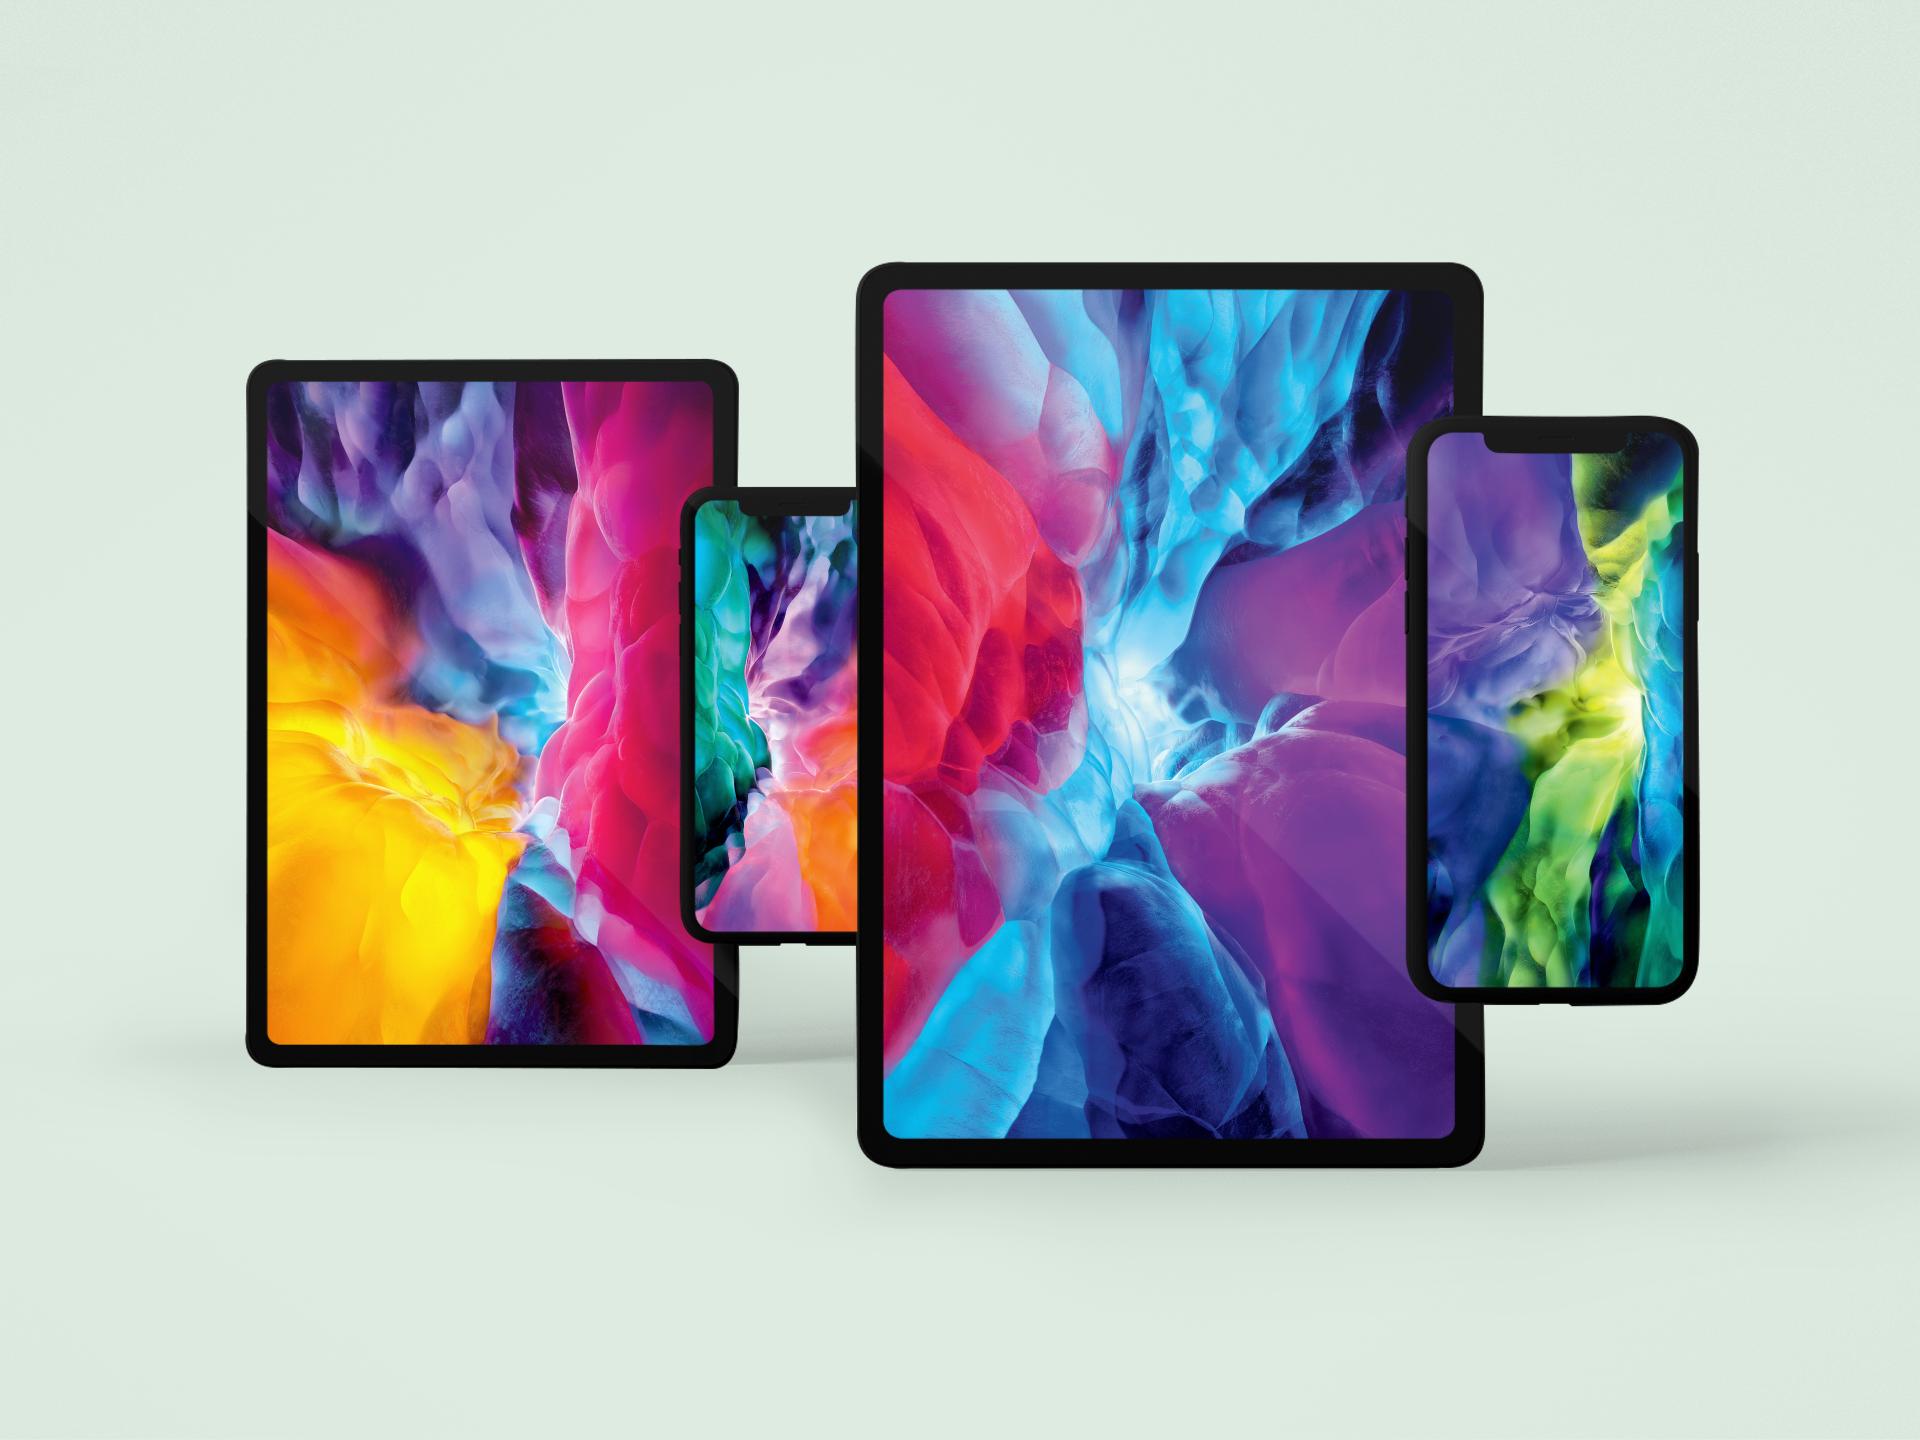 The new iPad Pro wallpapers for iPad iPhone desktop 1920x1440